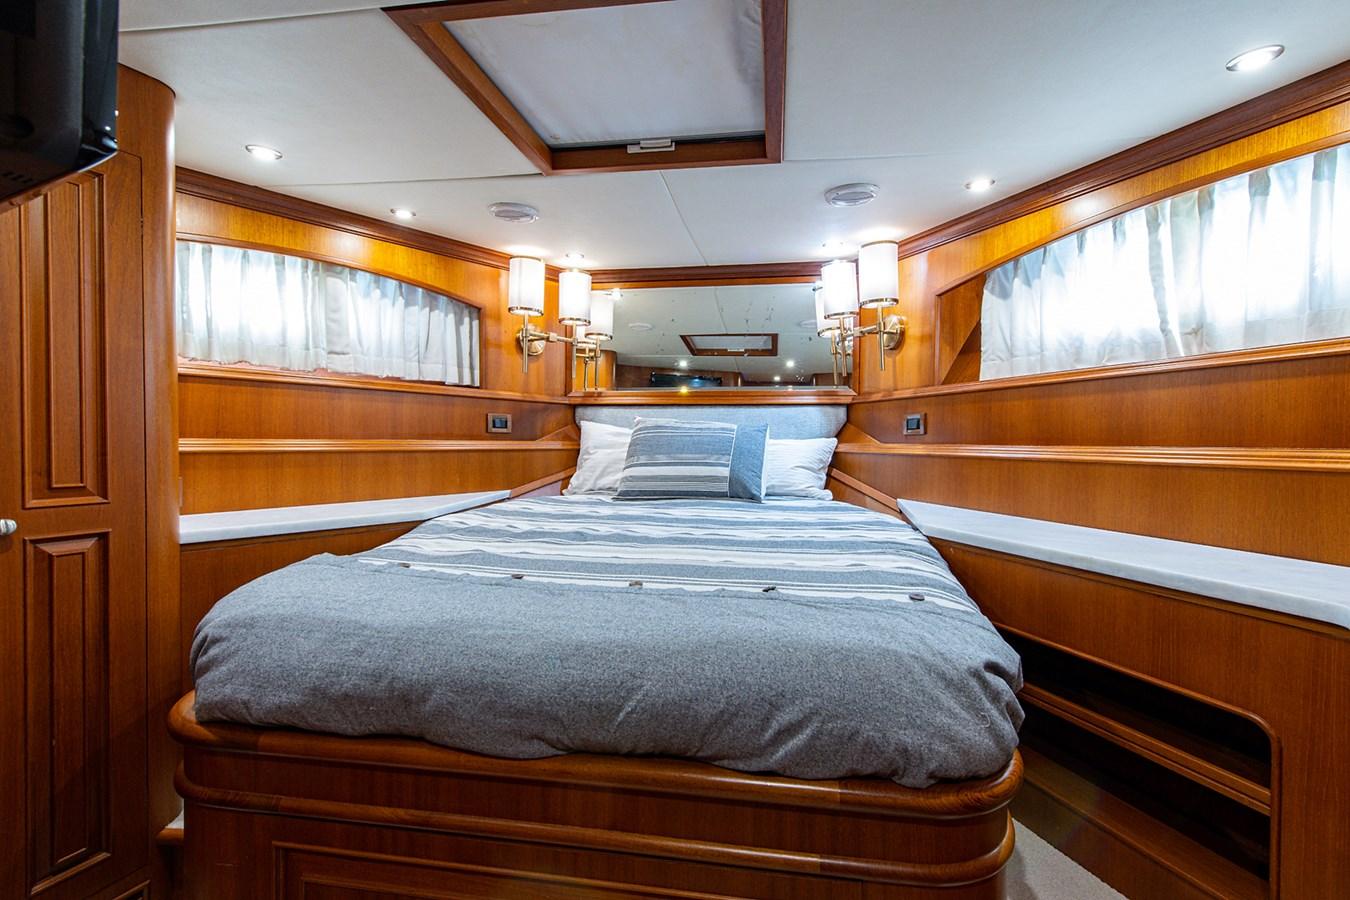 Tout Va Bien_Forward Stateroom1 2005 GRAND BANKS 64 Aleutian RP Motor Yacht 2726163